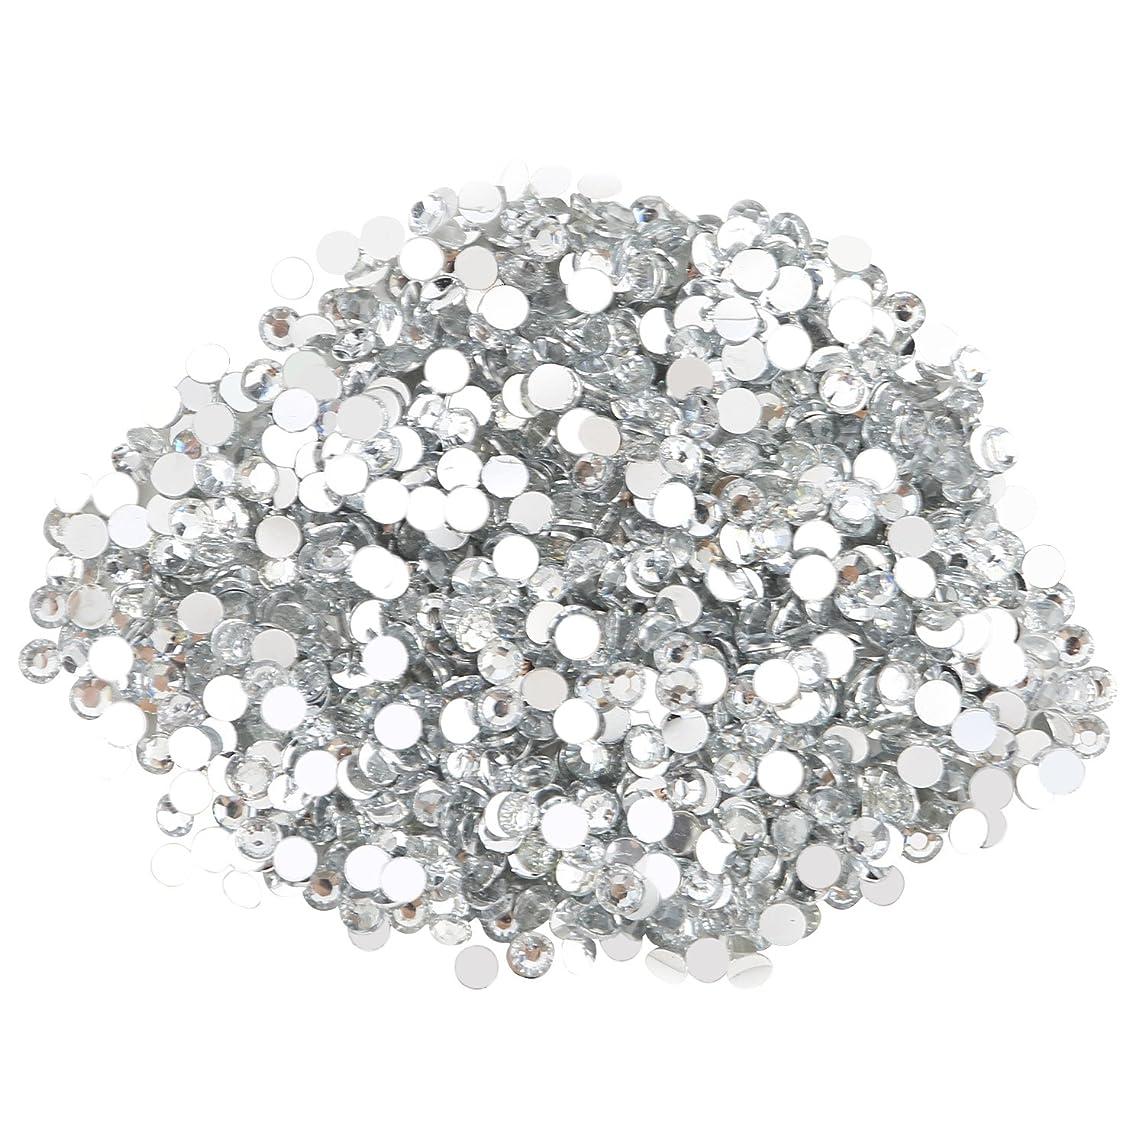 Round Beads for Jewelry Making - Flat Back Clear Crystal Rhinestones (3 mm) Wholesale Bulk - Yazycraft